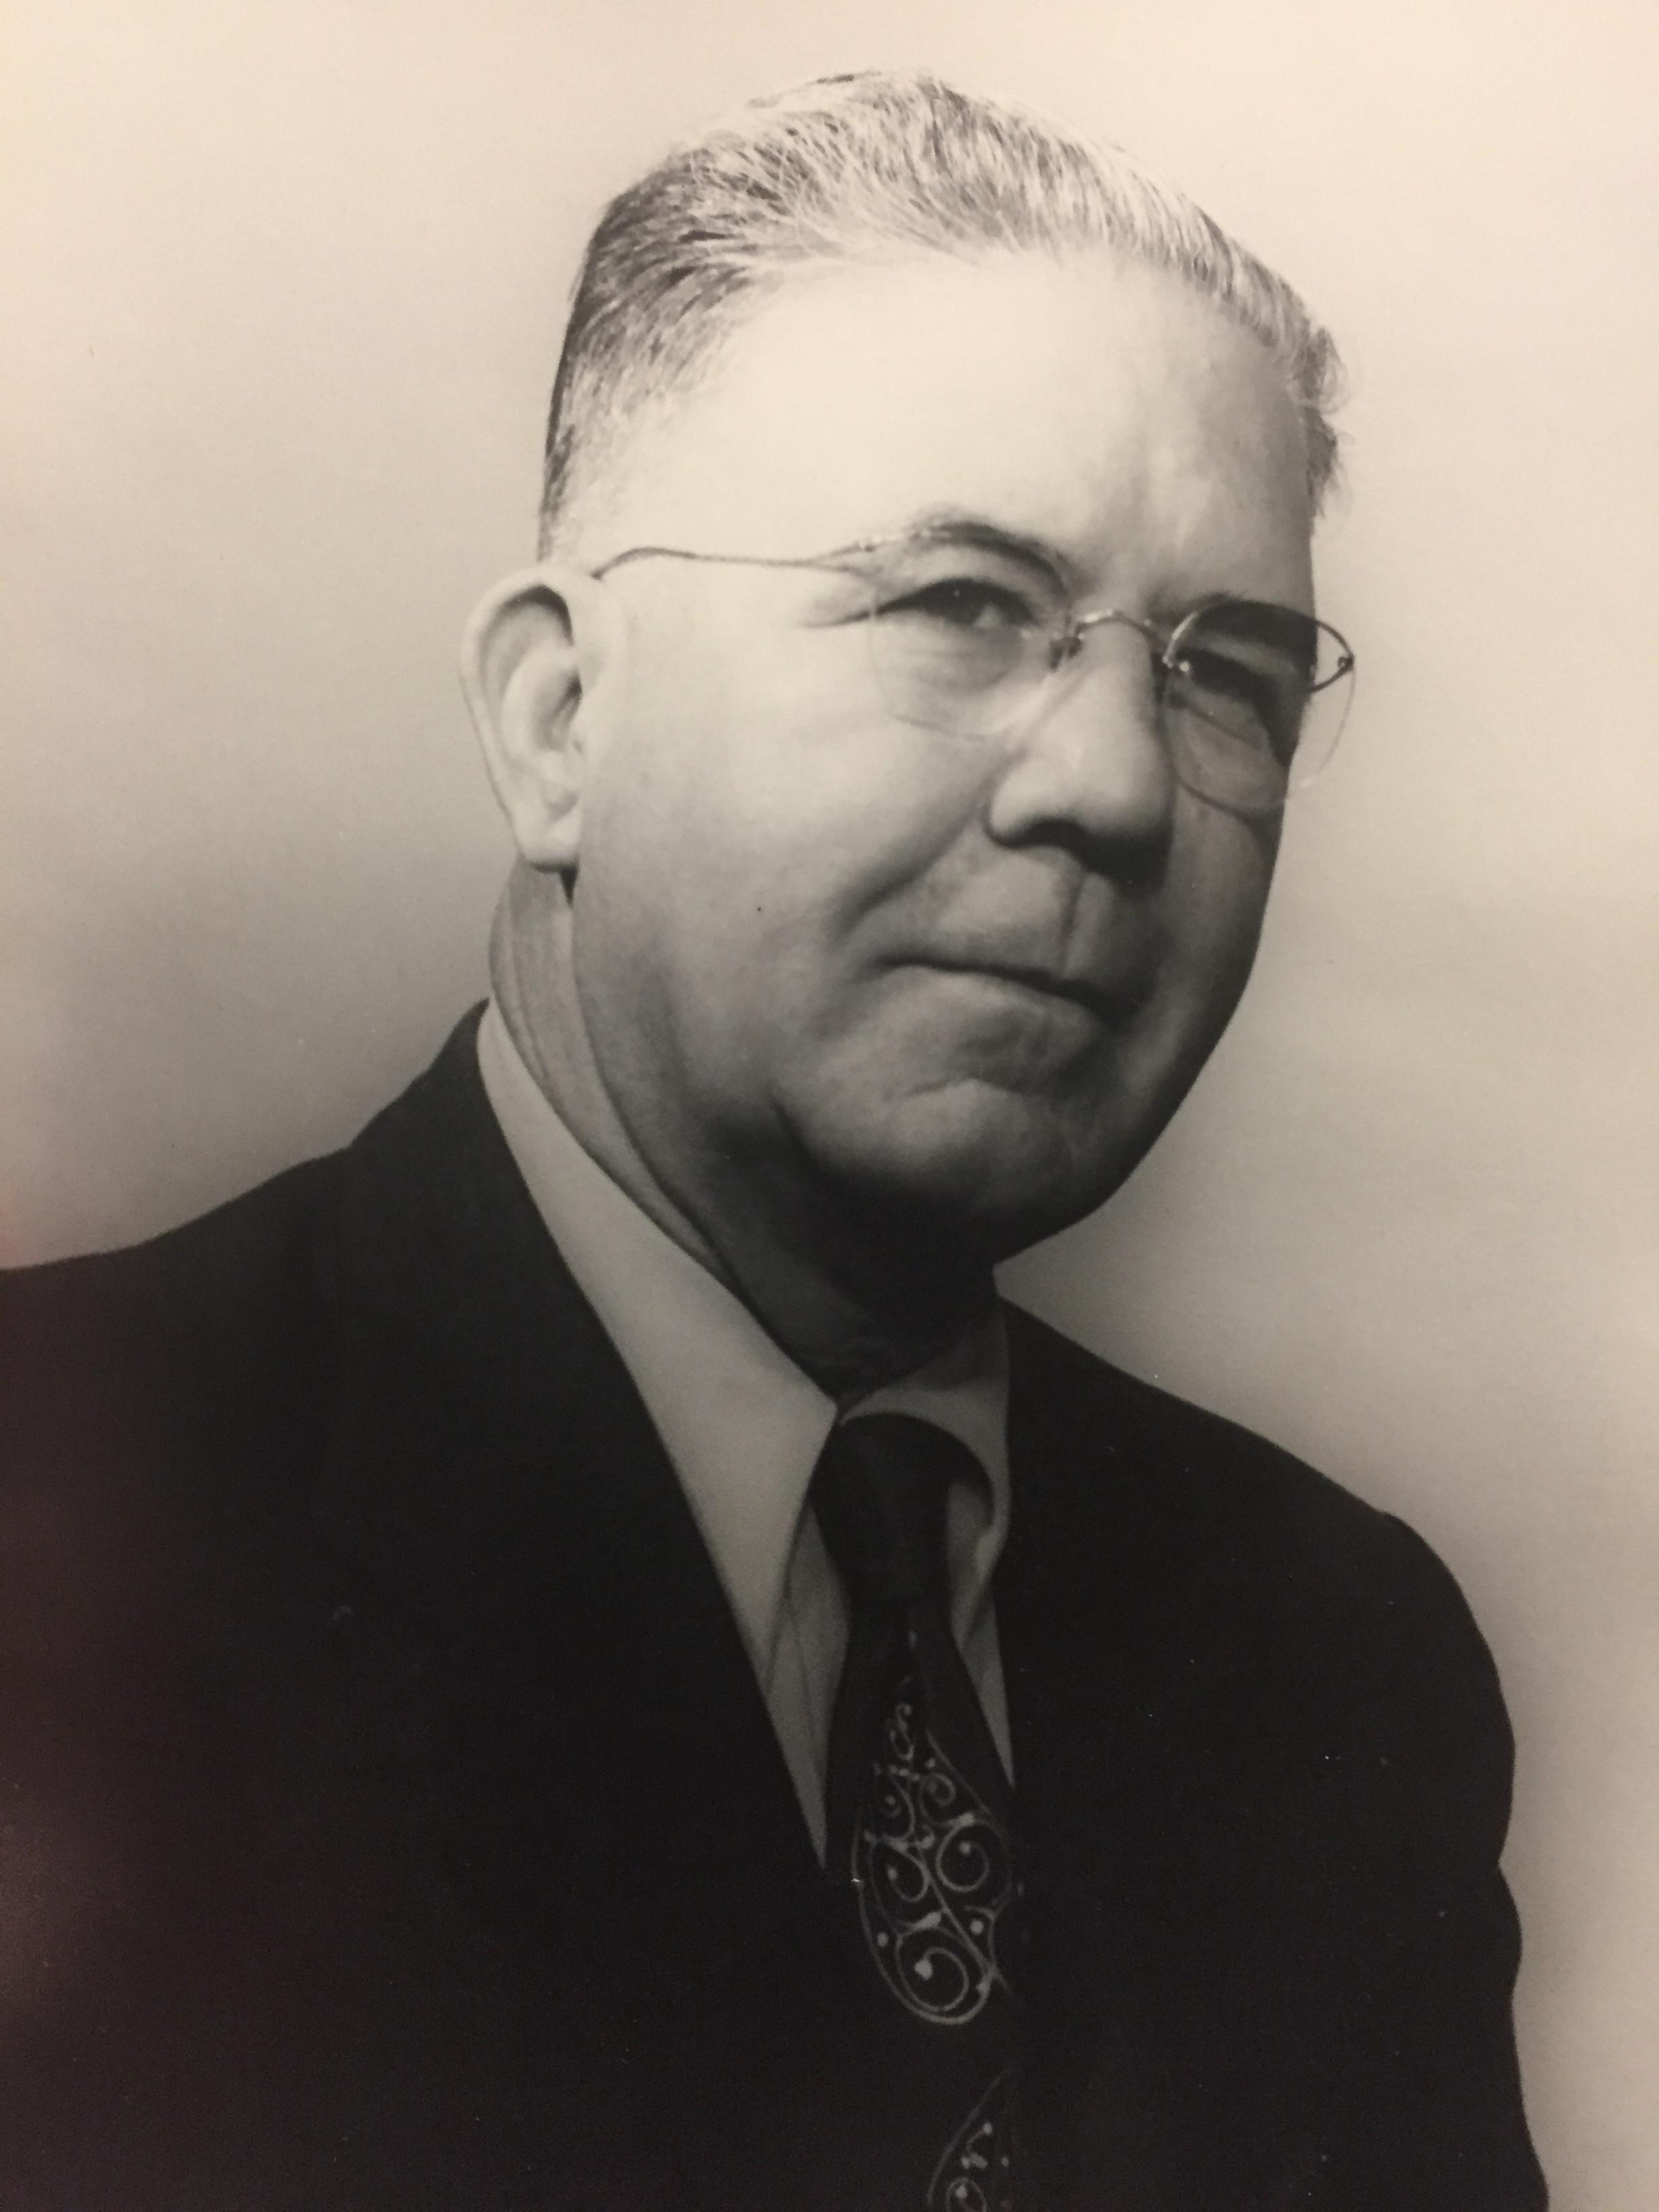 Police Officer Alexander Clarence Haddock | El Segundo Police Department, California